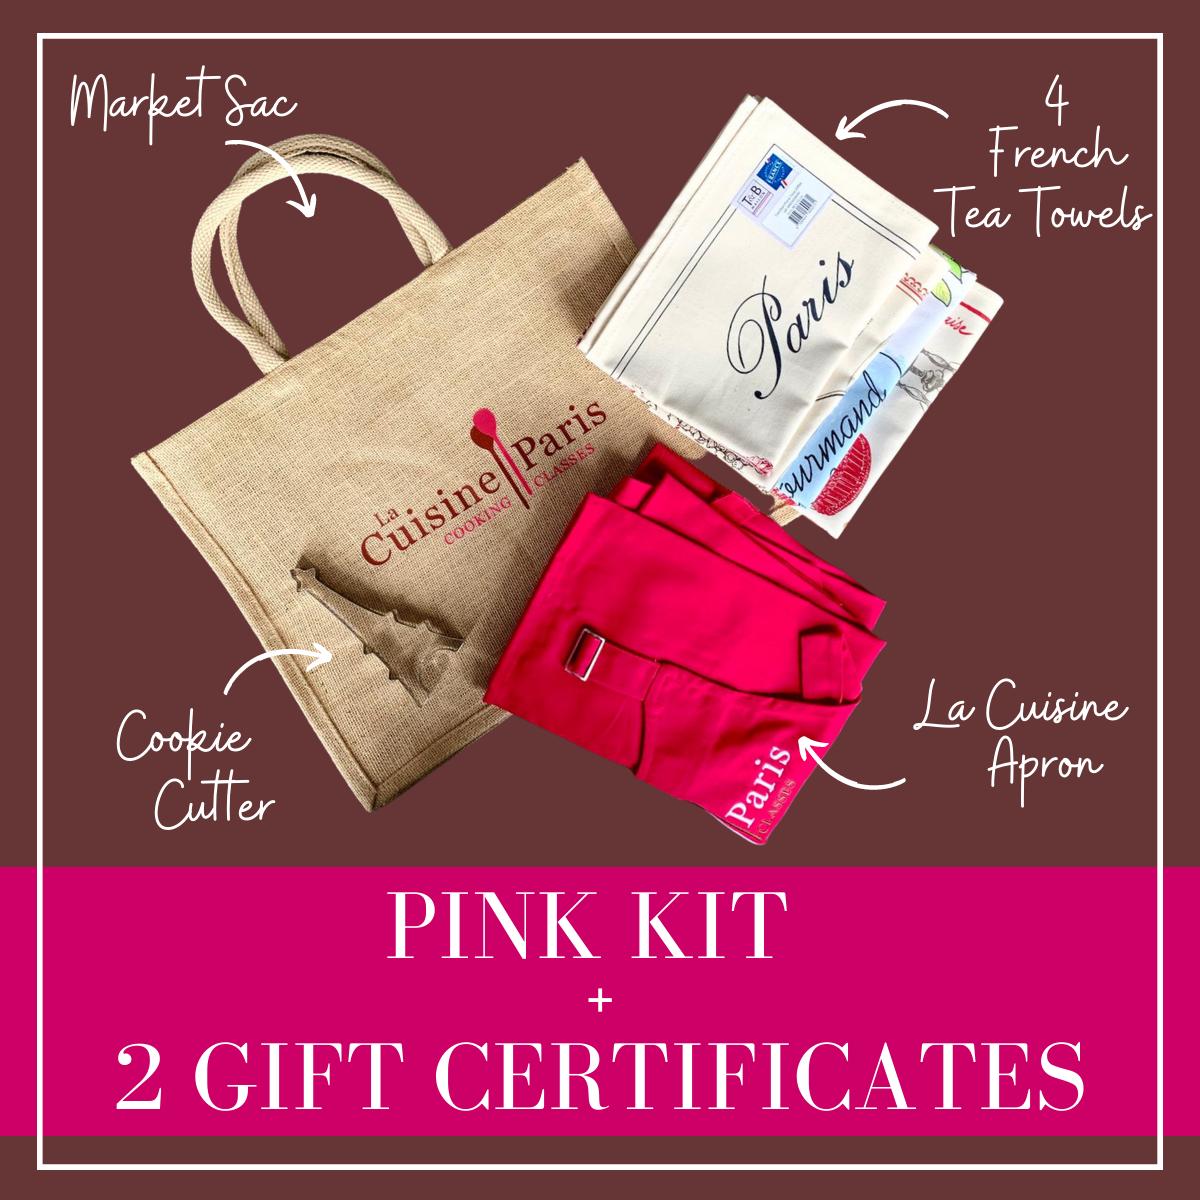 Pink La Cuisine Paris Kit + 2 Video Gift Certificate